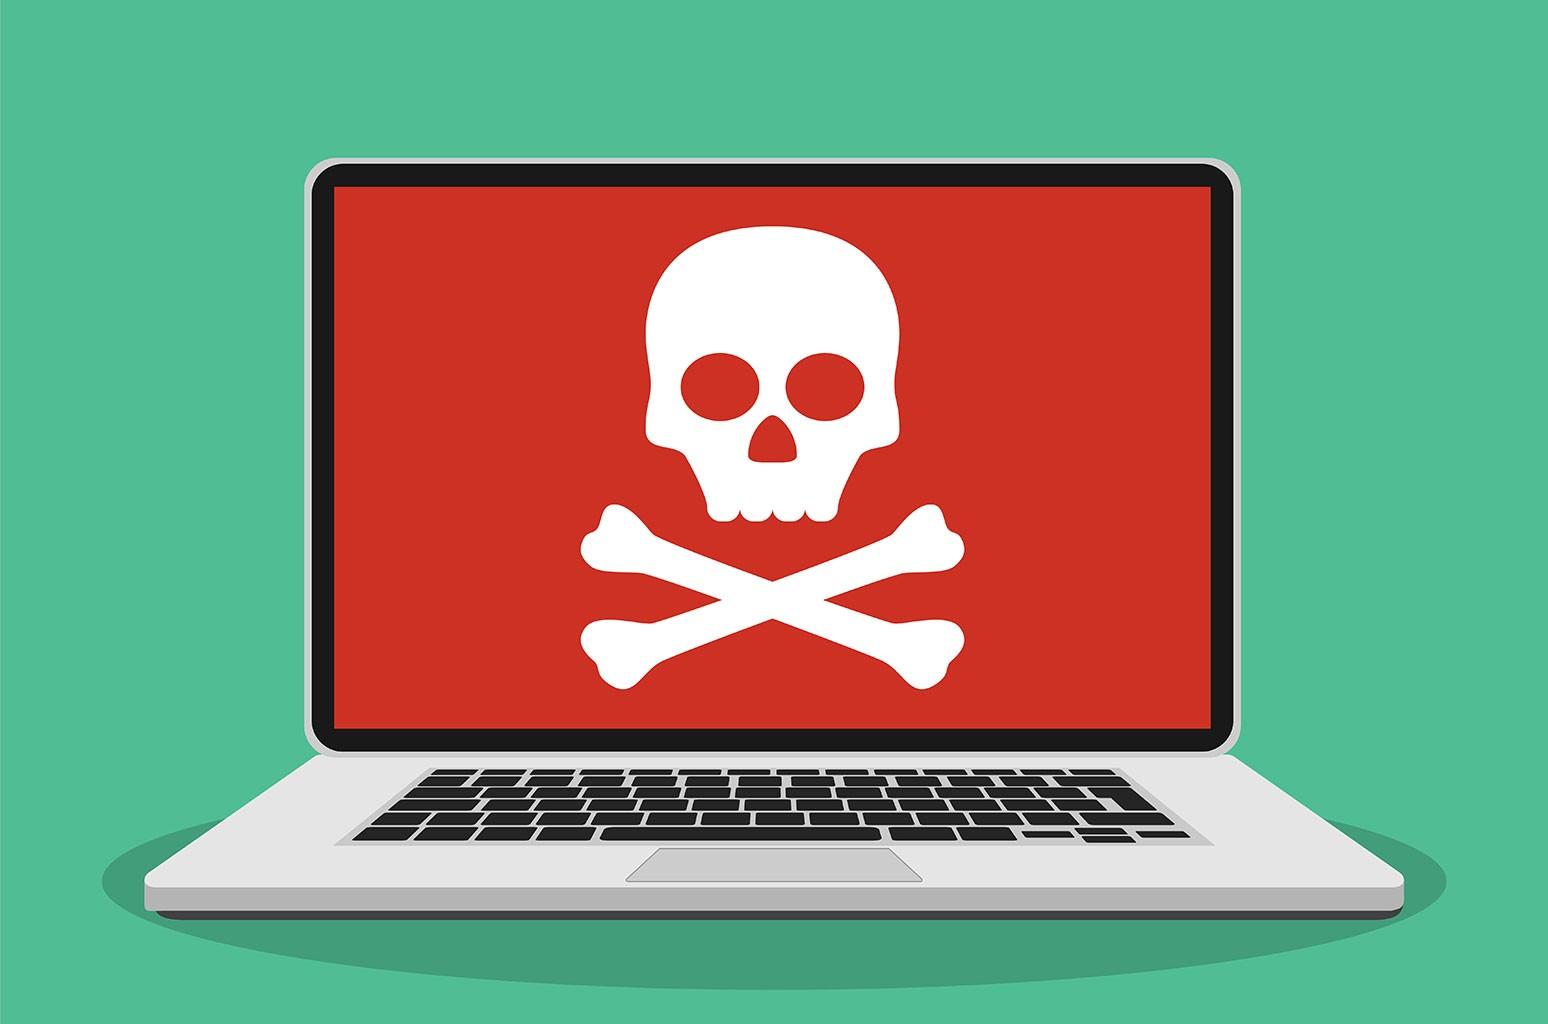 piracy computer